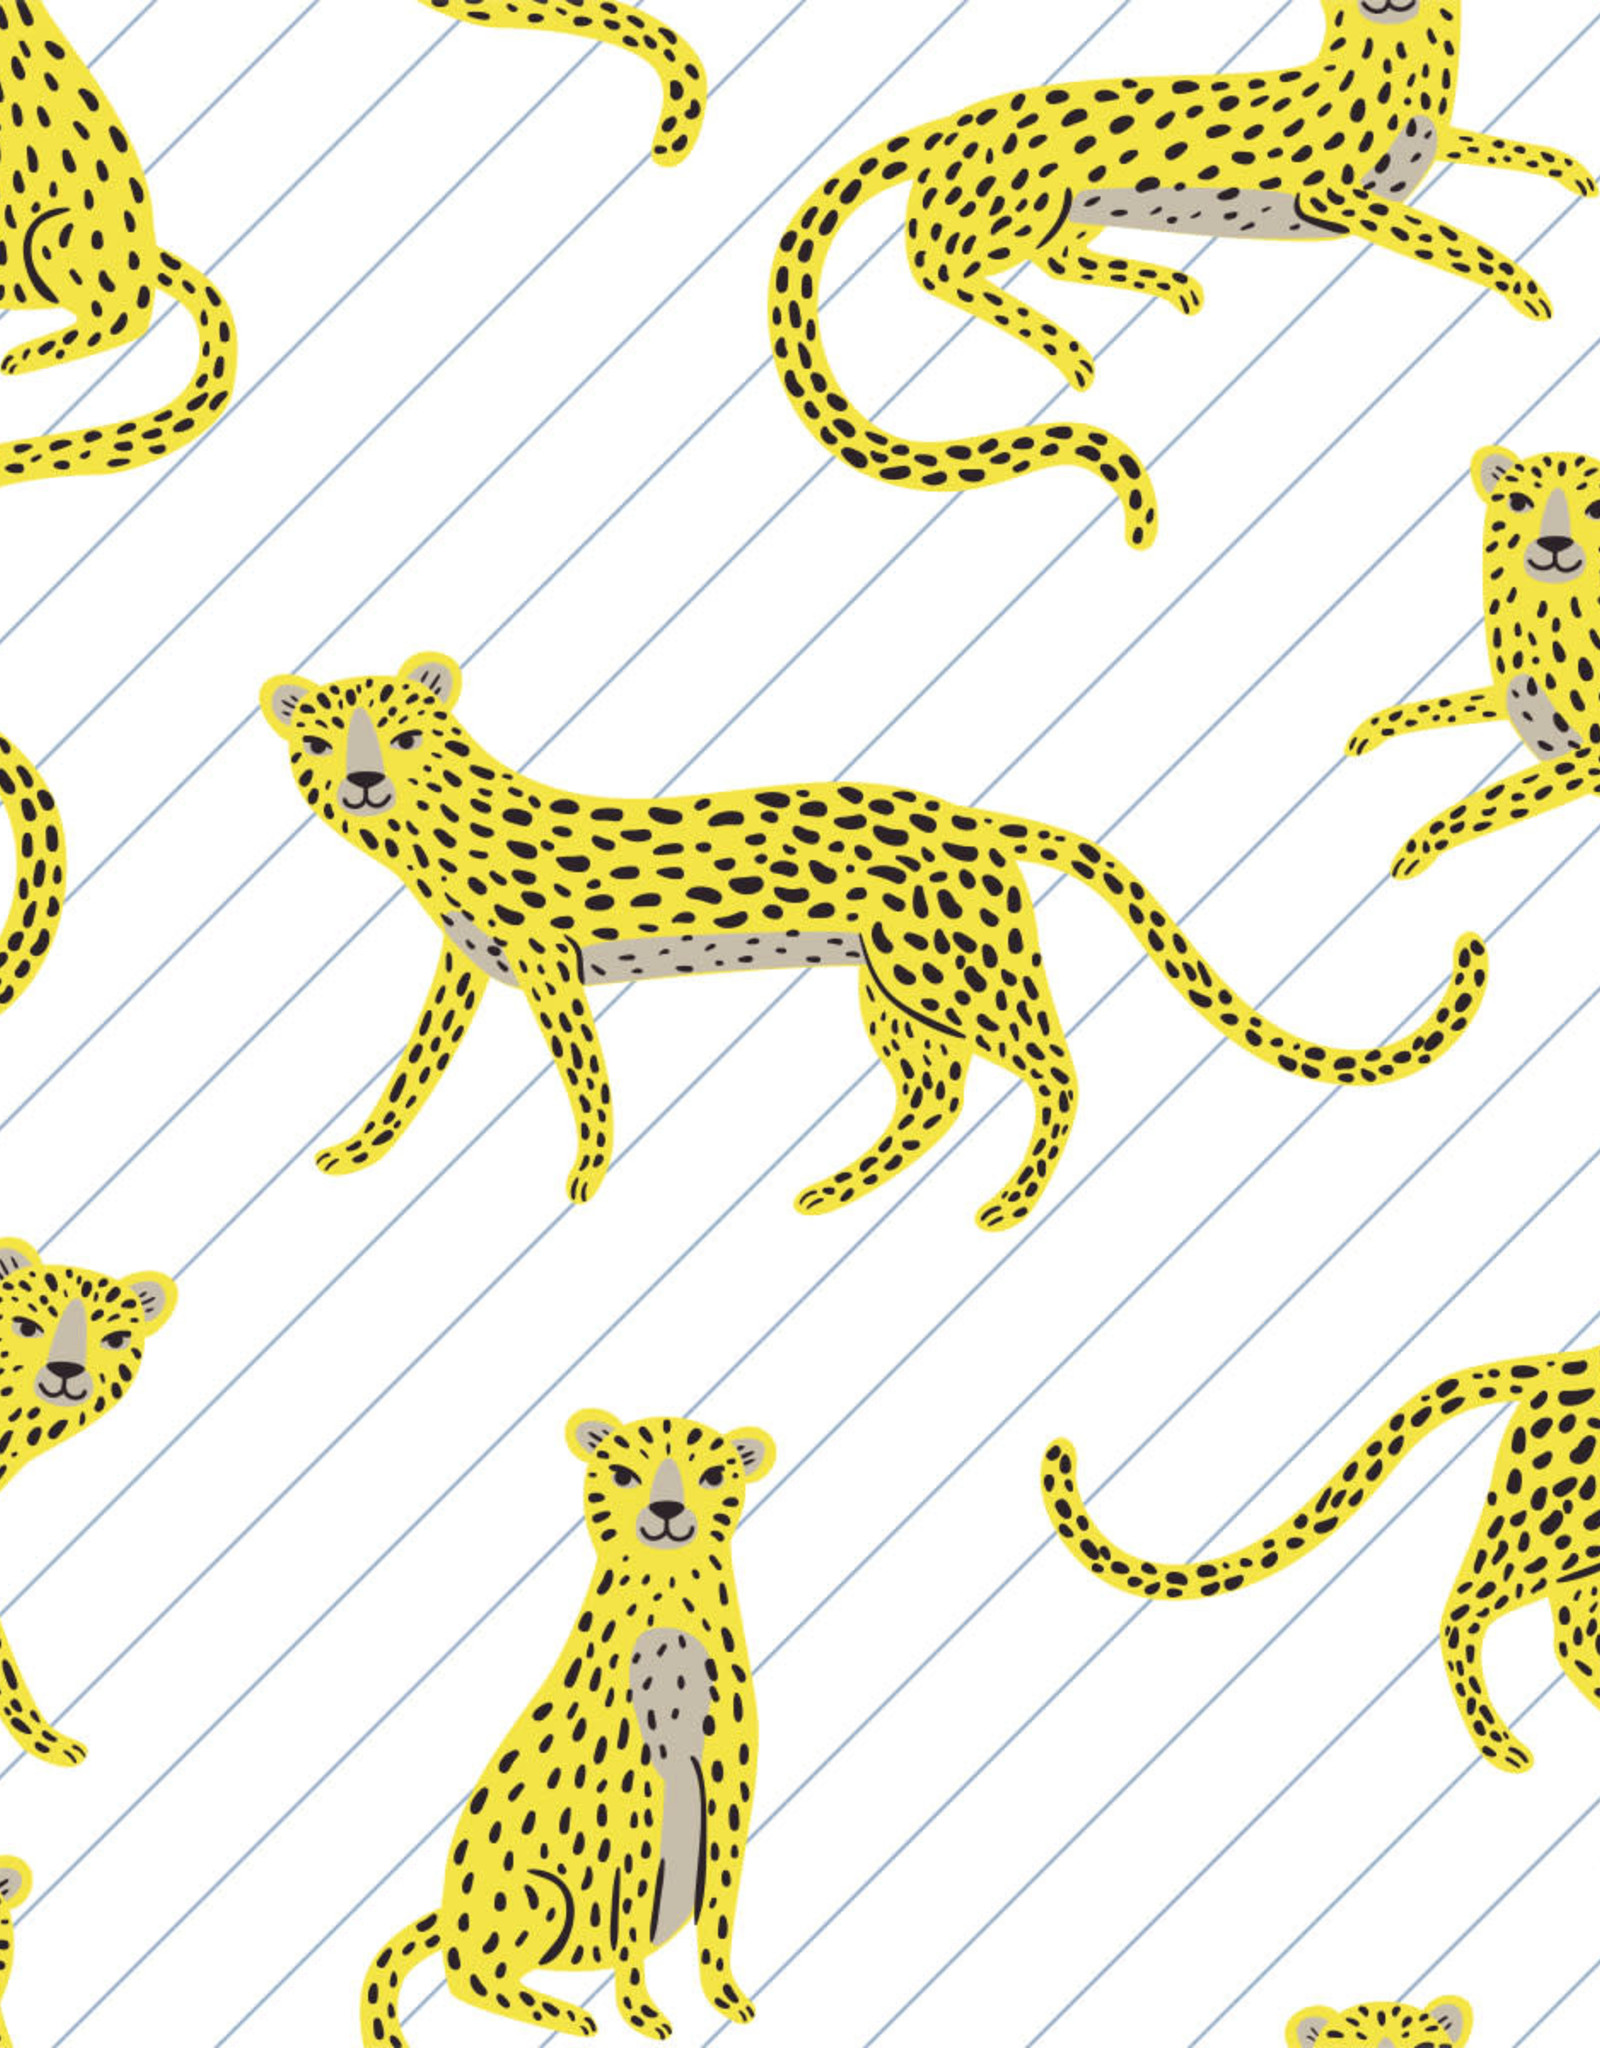 ABF ABF Say Cheetay